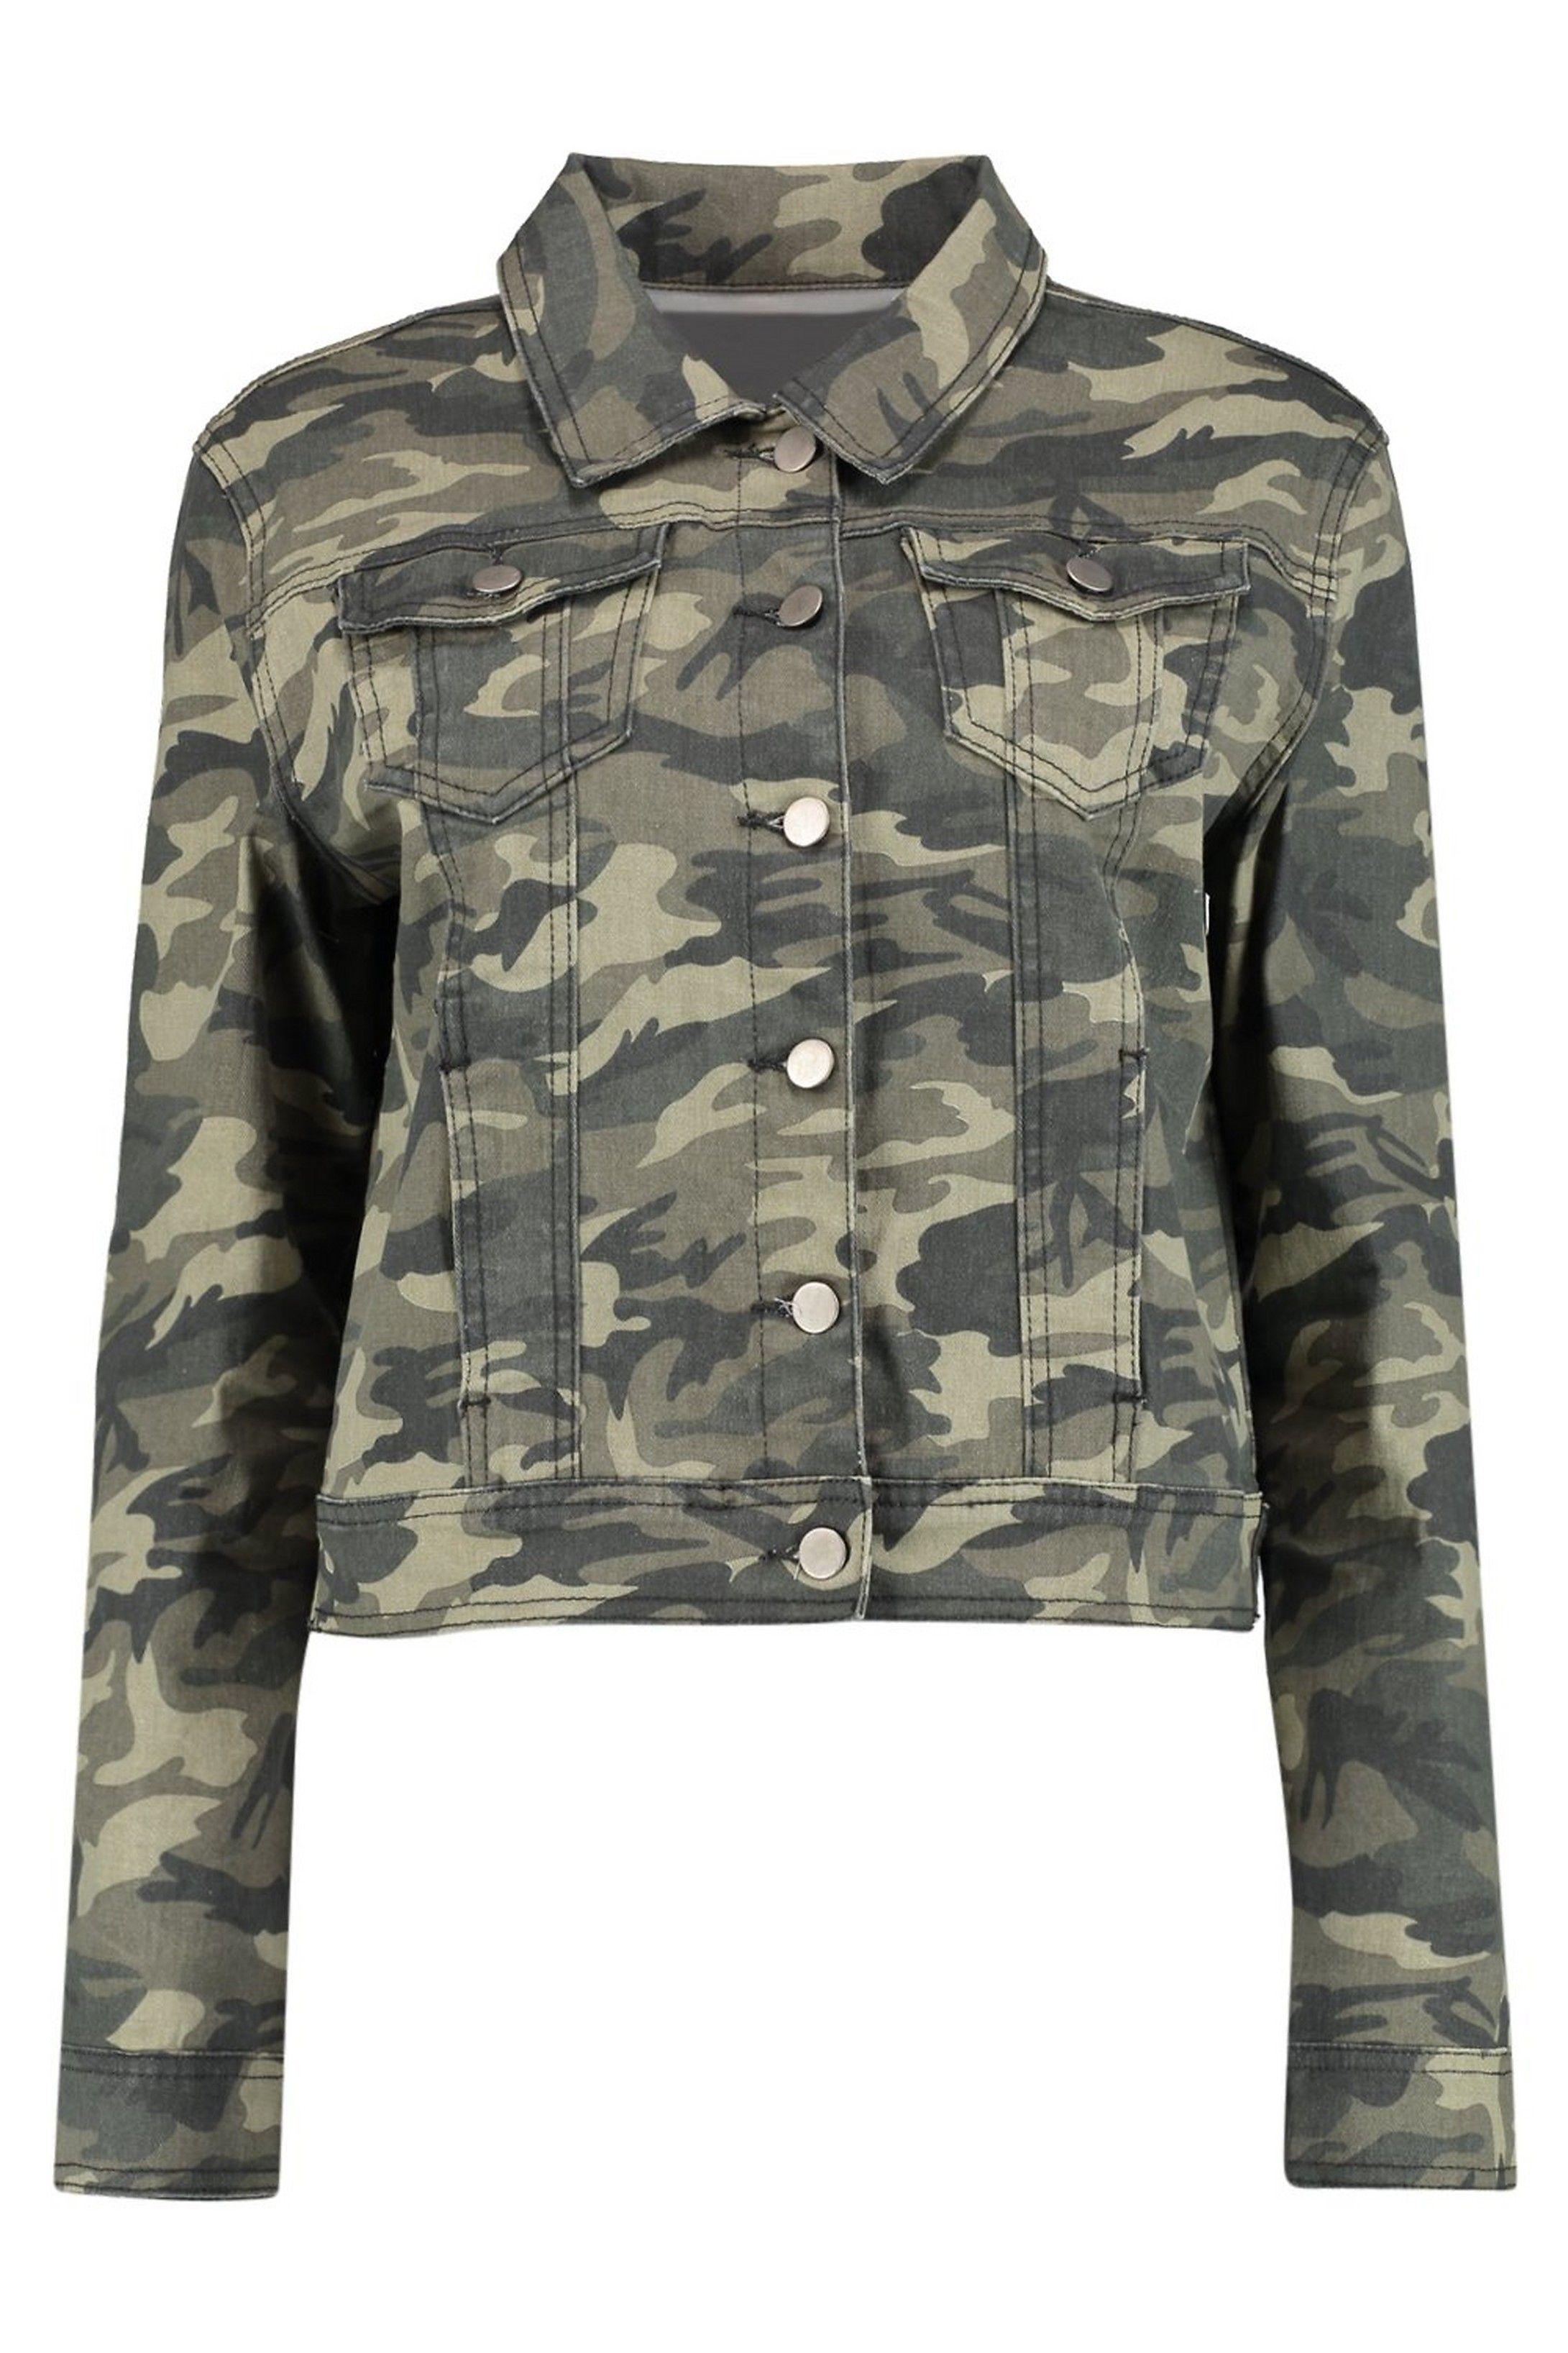 Camouflage Denim Jacket Boohoo Camoflauge Jacket Fitted Denim Jacket Camo Denim Jacket [ 3272 x 2181 Pixel ]